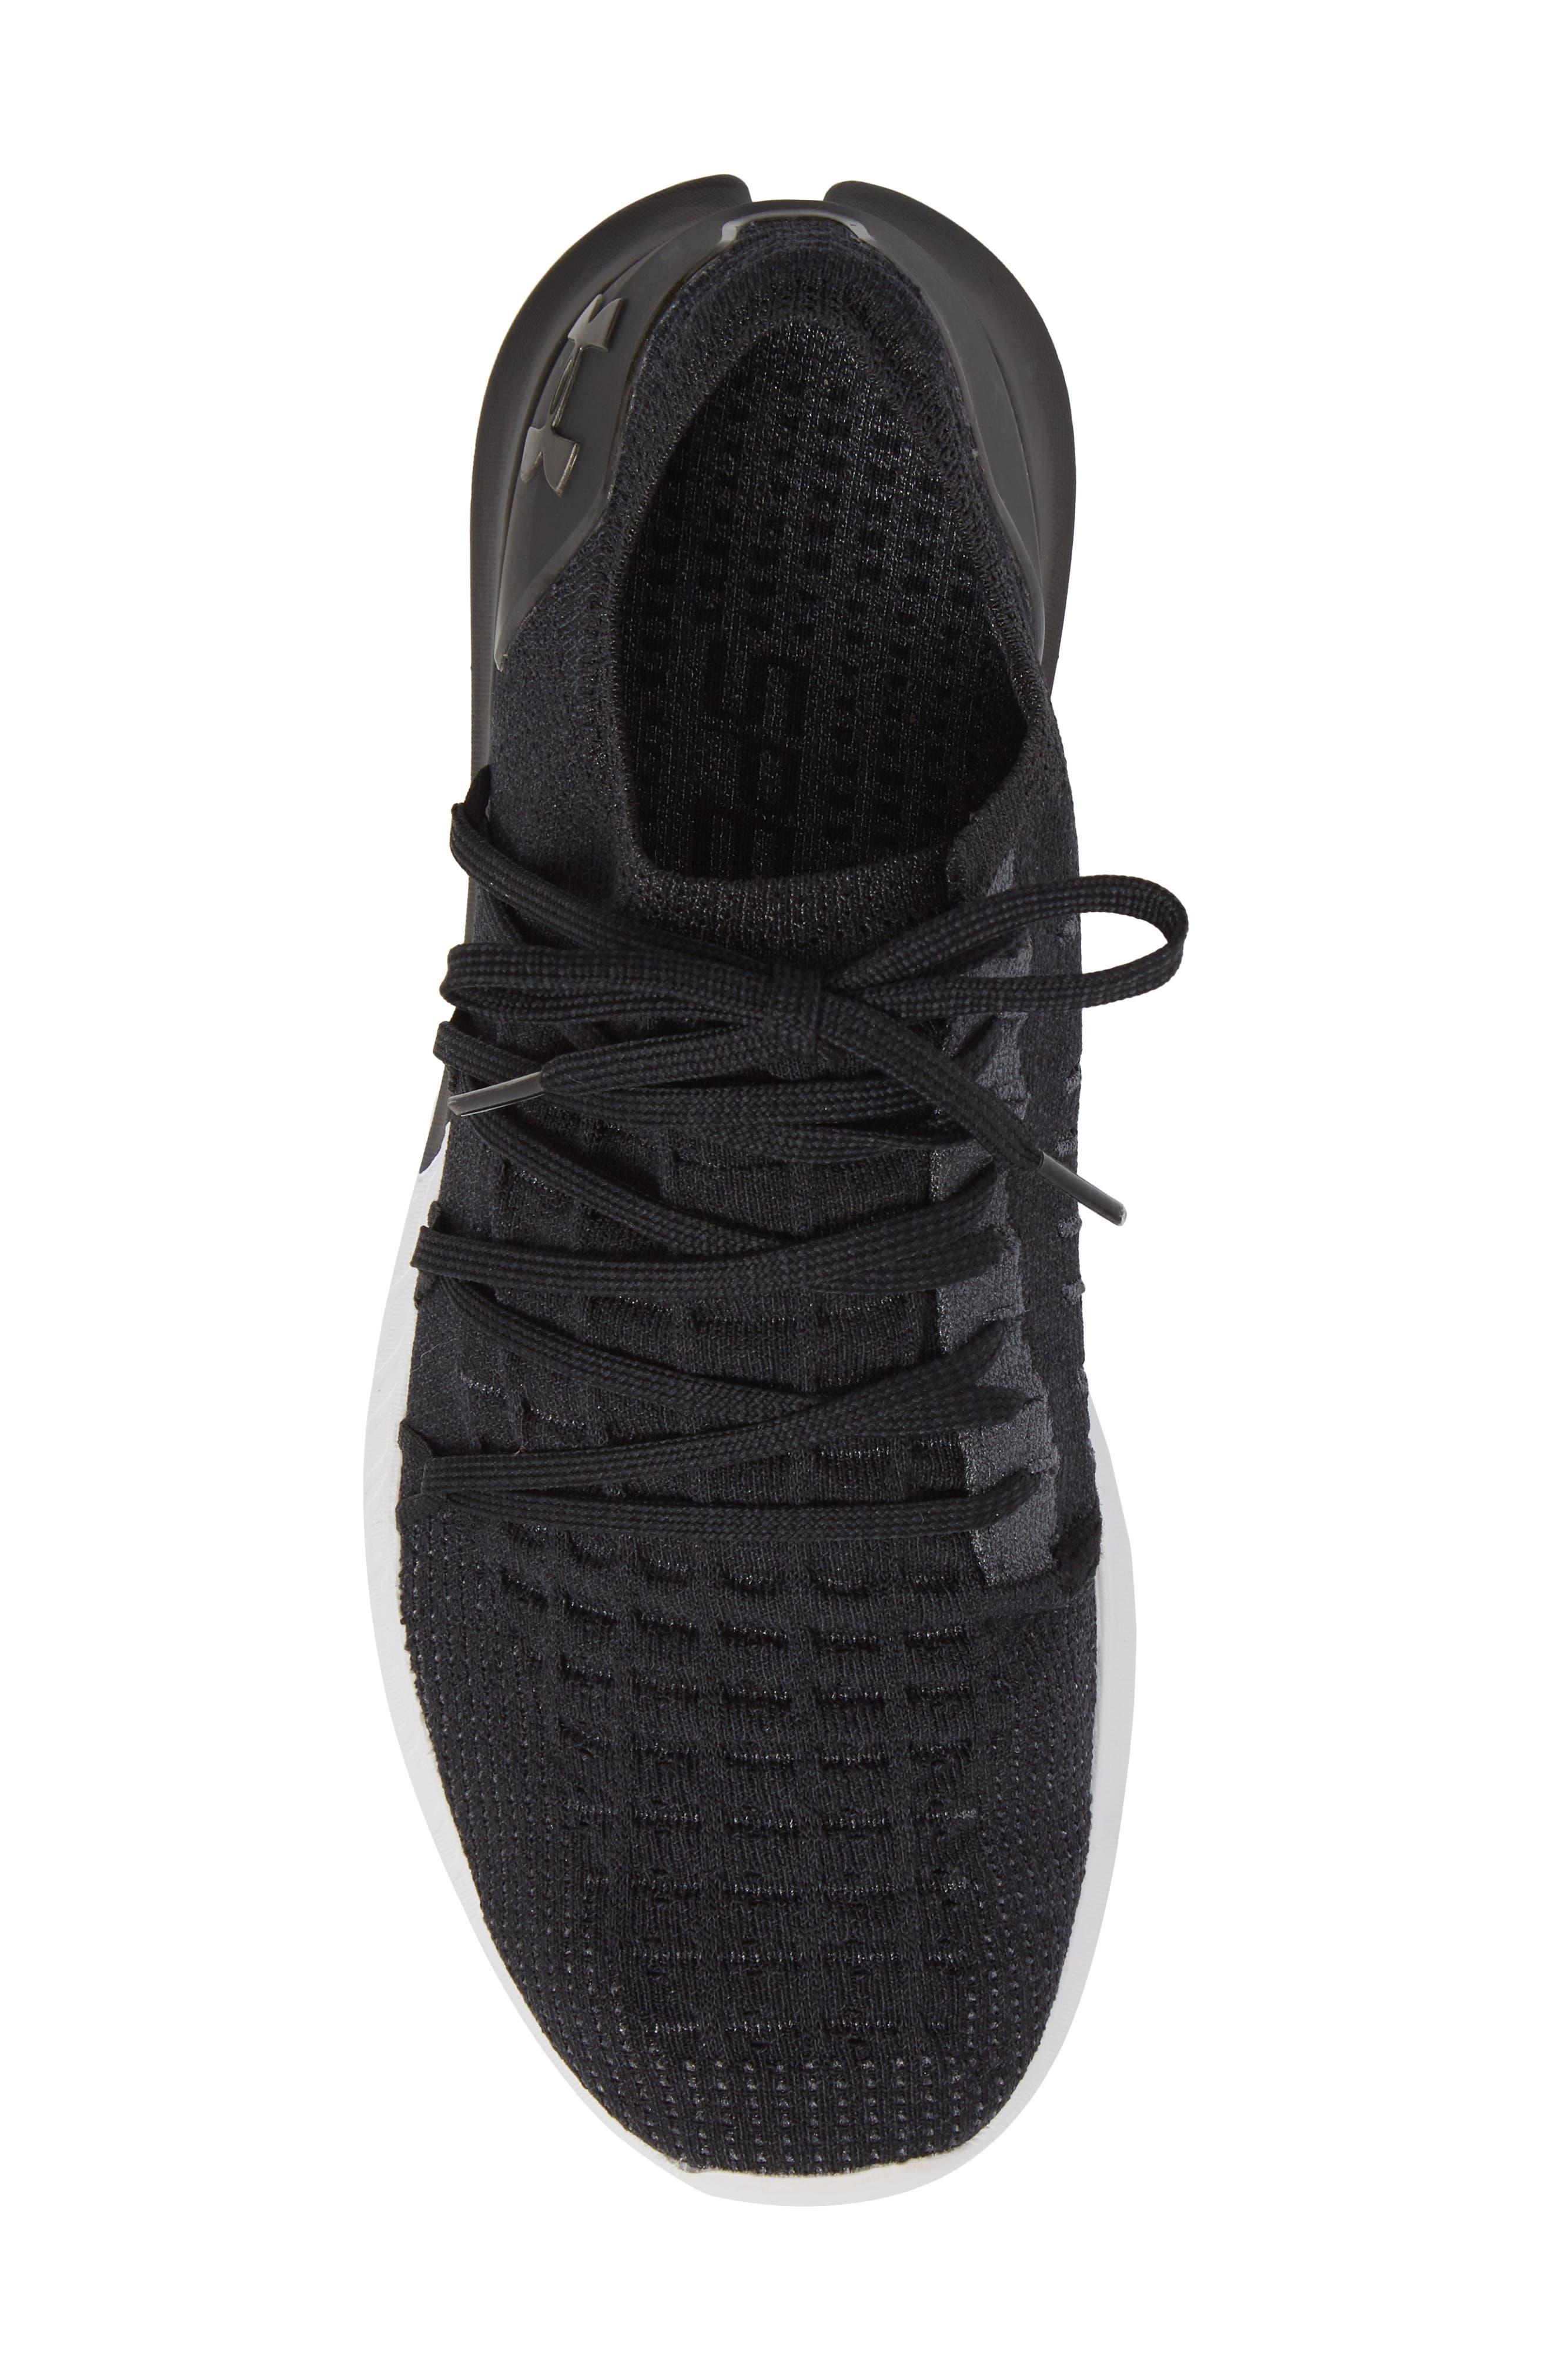 Speedform<sup>®</sup> Slingshot 2 Sneaker,                             Alternate thumbnail 5, color,                             BLACK / ANTHRACITE / METALLIC